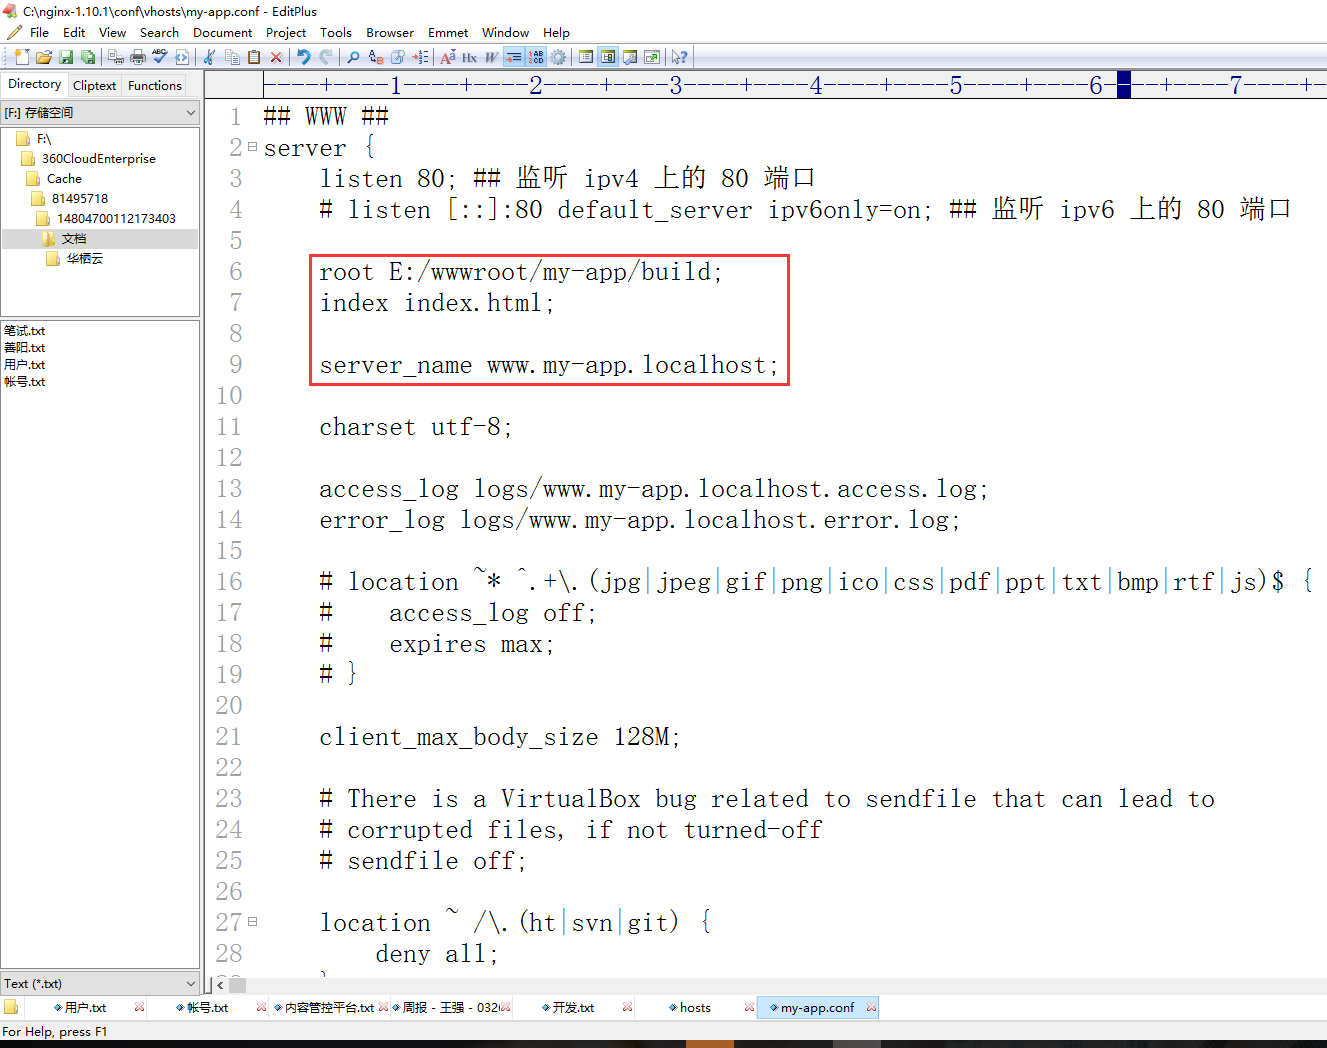 部署在 Nginx,提供index.html,新建:C:\nginx-1.10.1\conf\vhosts\my-app.conf